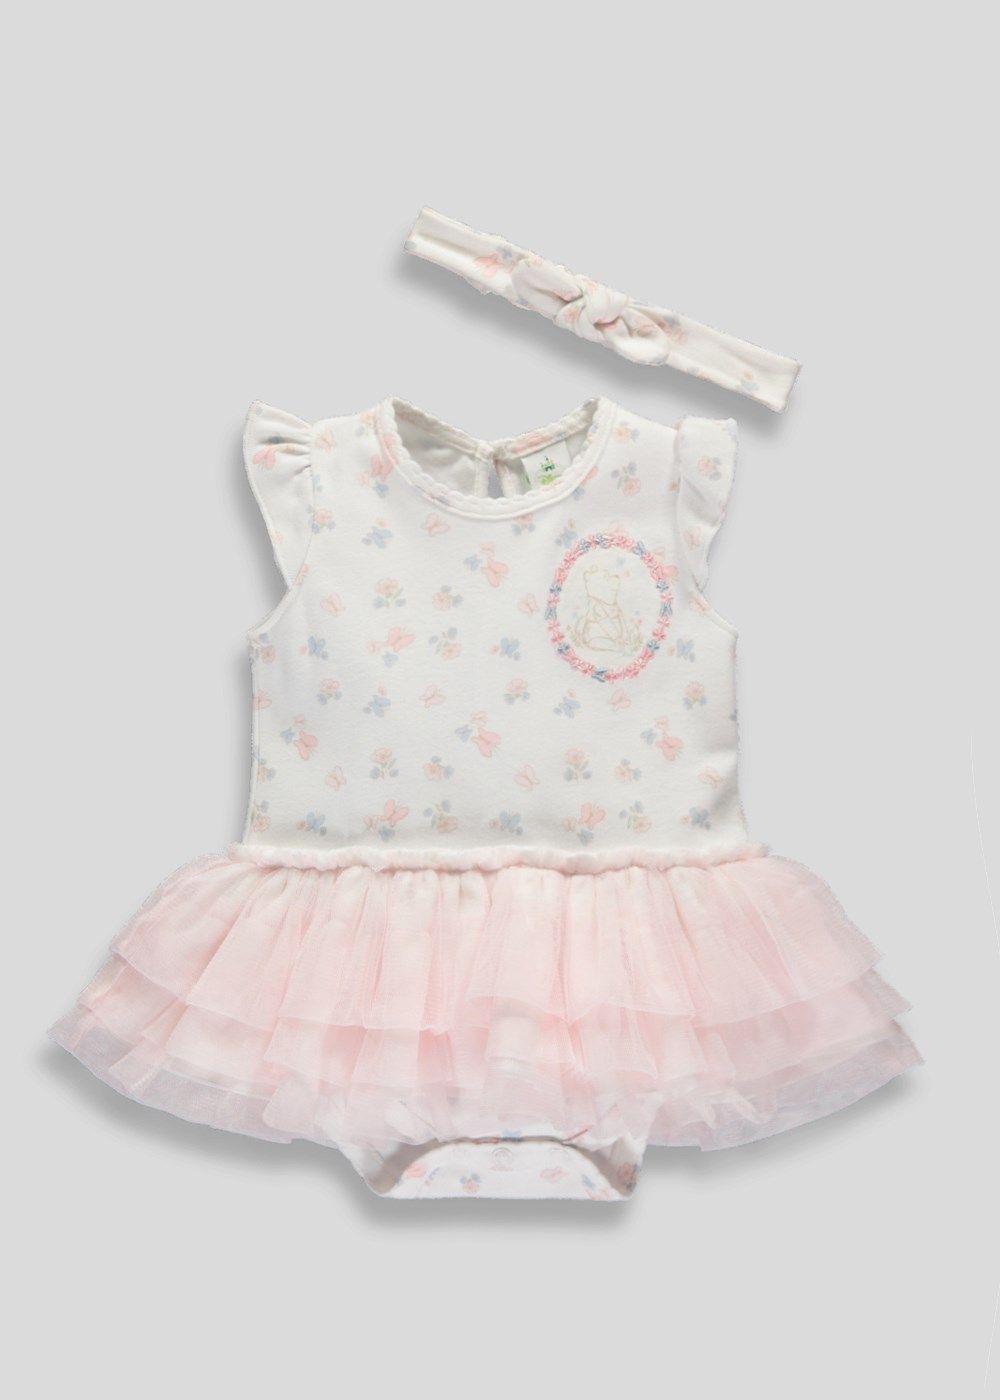 b1bffcd4a2d1 Girls Winnie The Pooh Tutu Romper (Tiny Baby-12mths) – Matalan. Kids  Clothing GirlsPink TutuBaby NewbornGirls ...